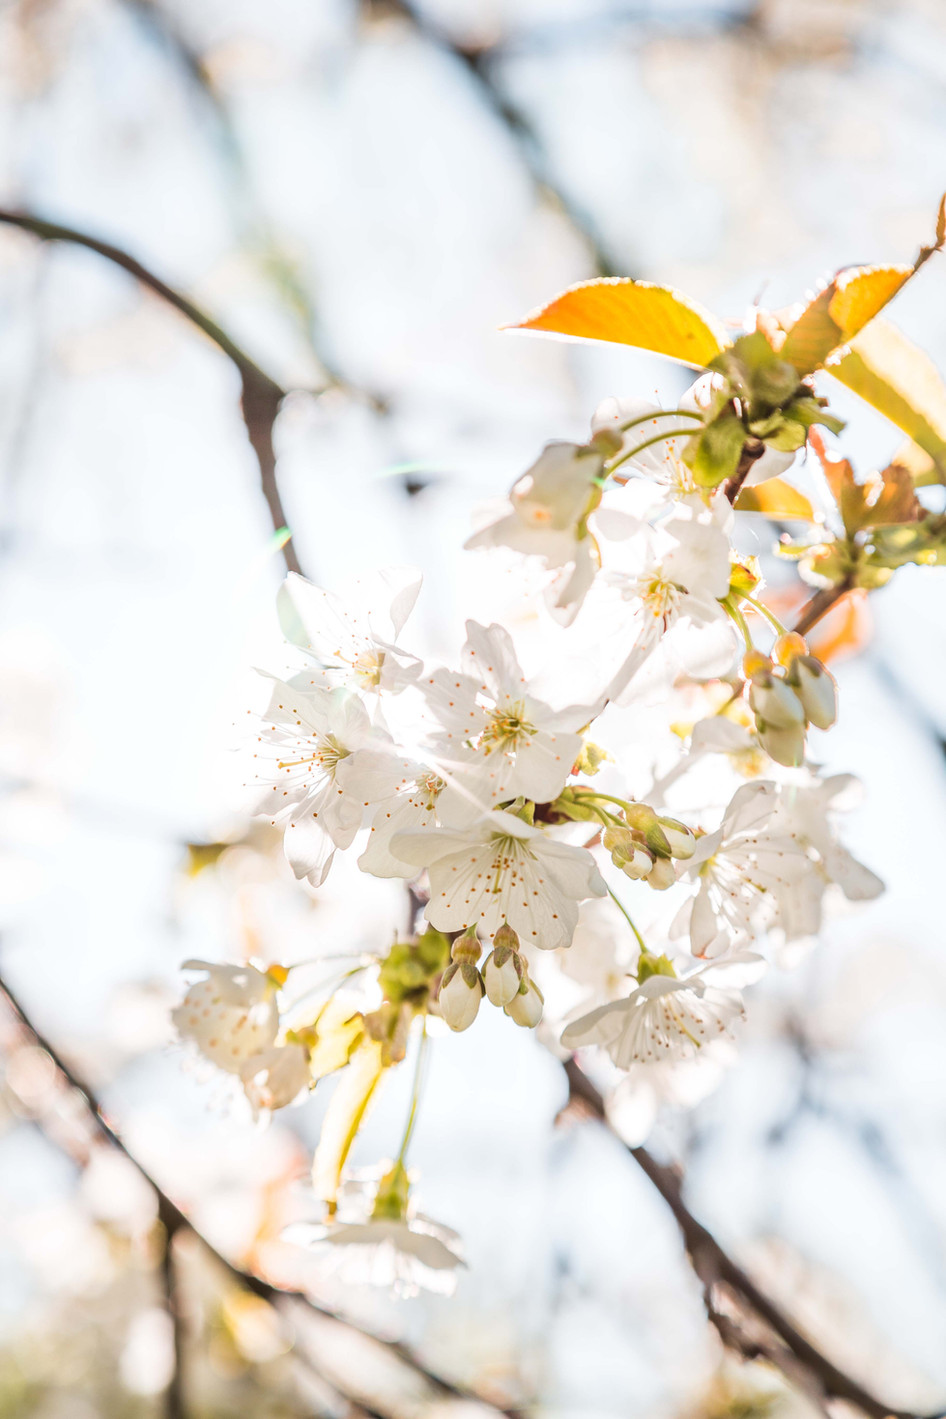 Fleur blanche, 2020